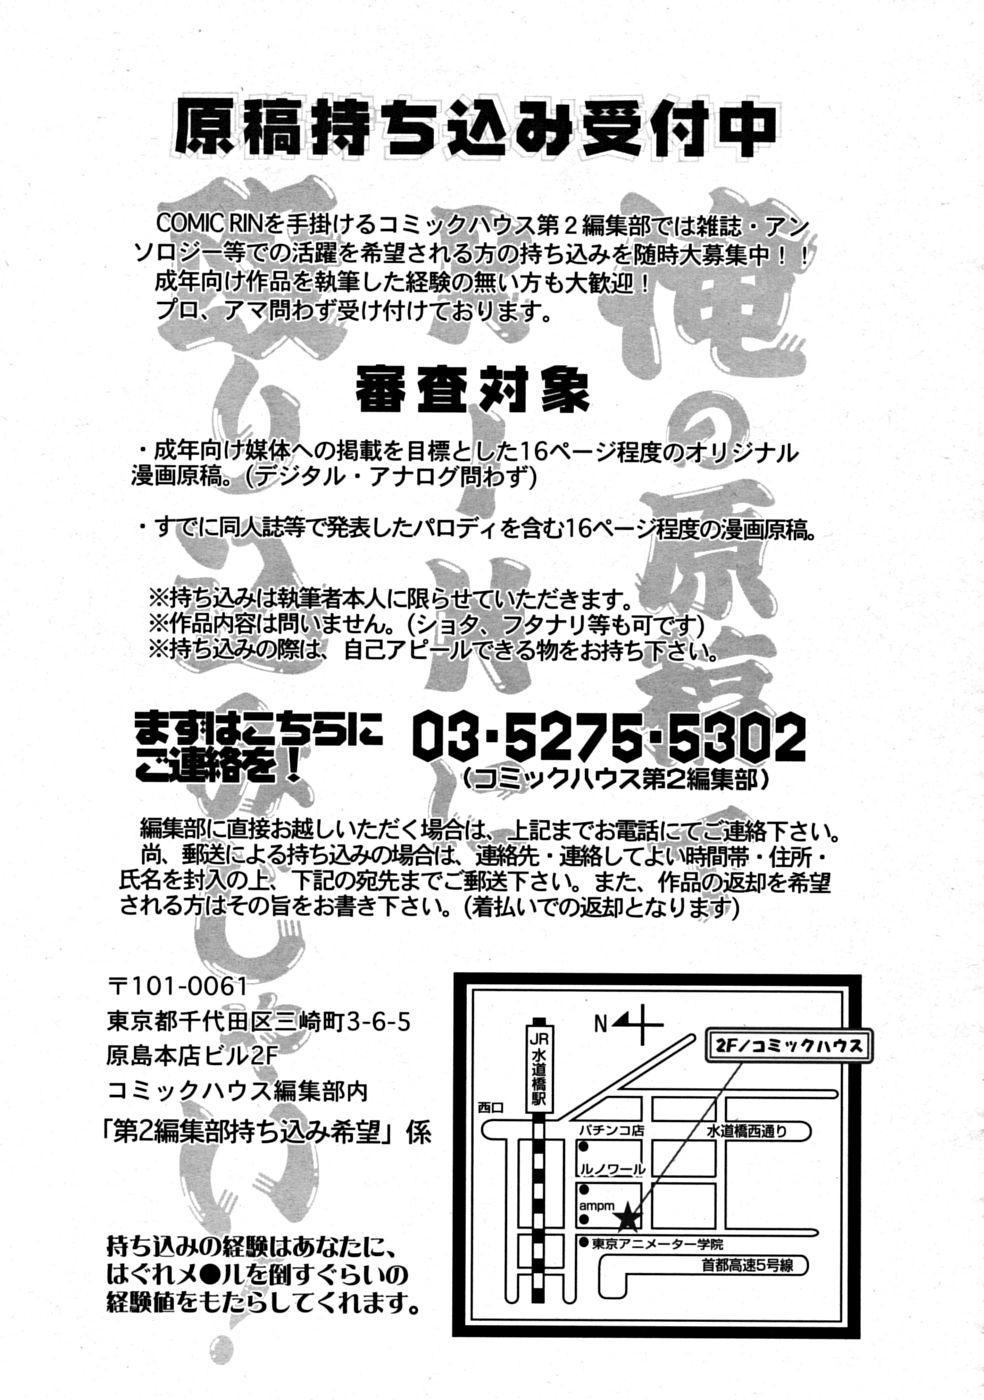 COMIC RiN 2008-08 Vol.44 306